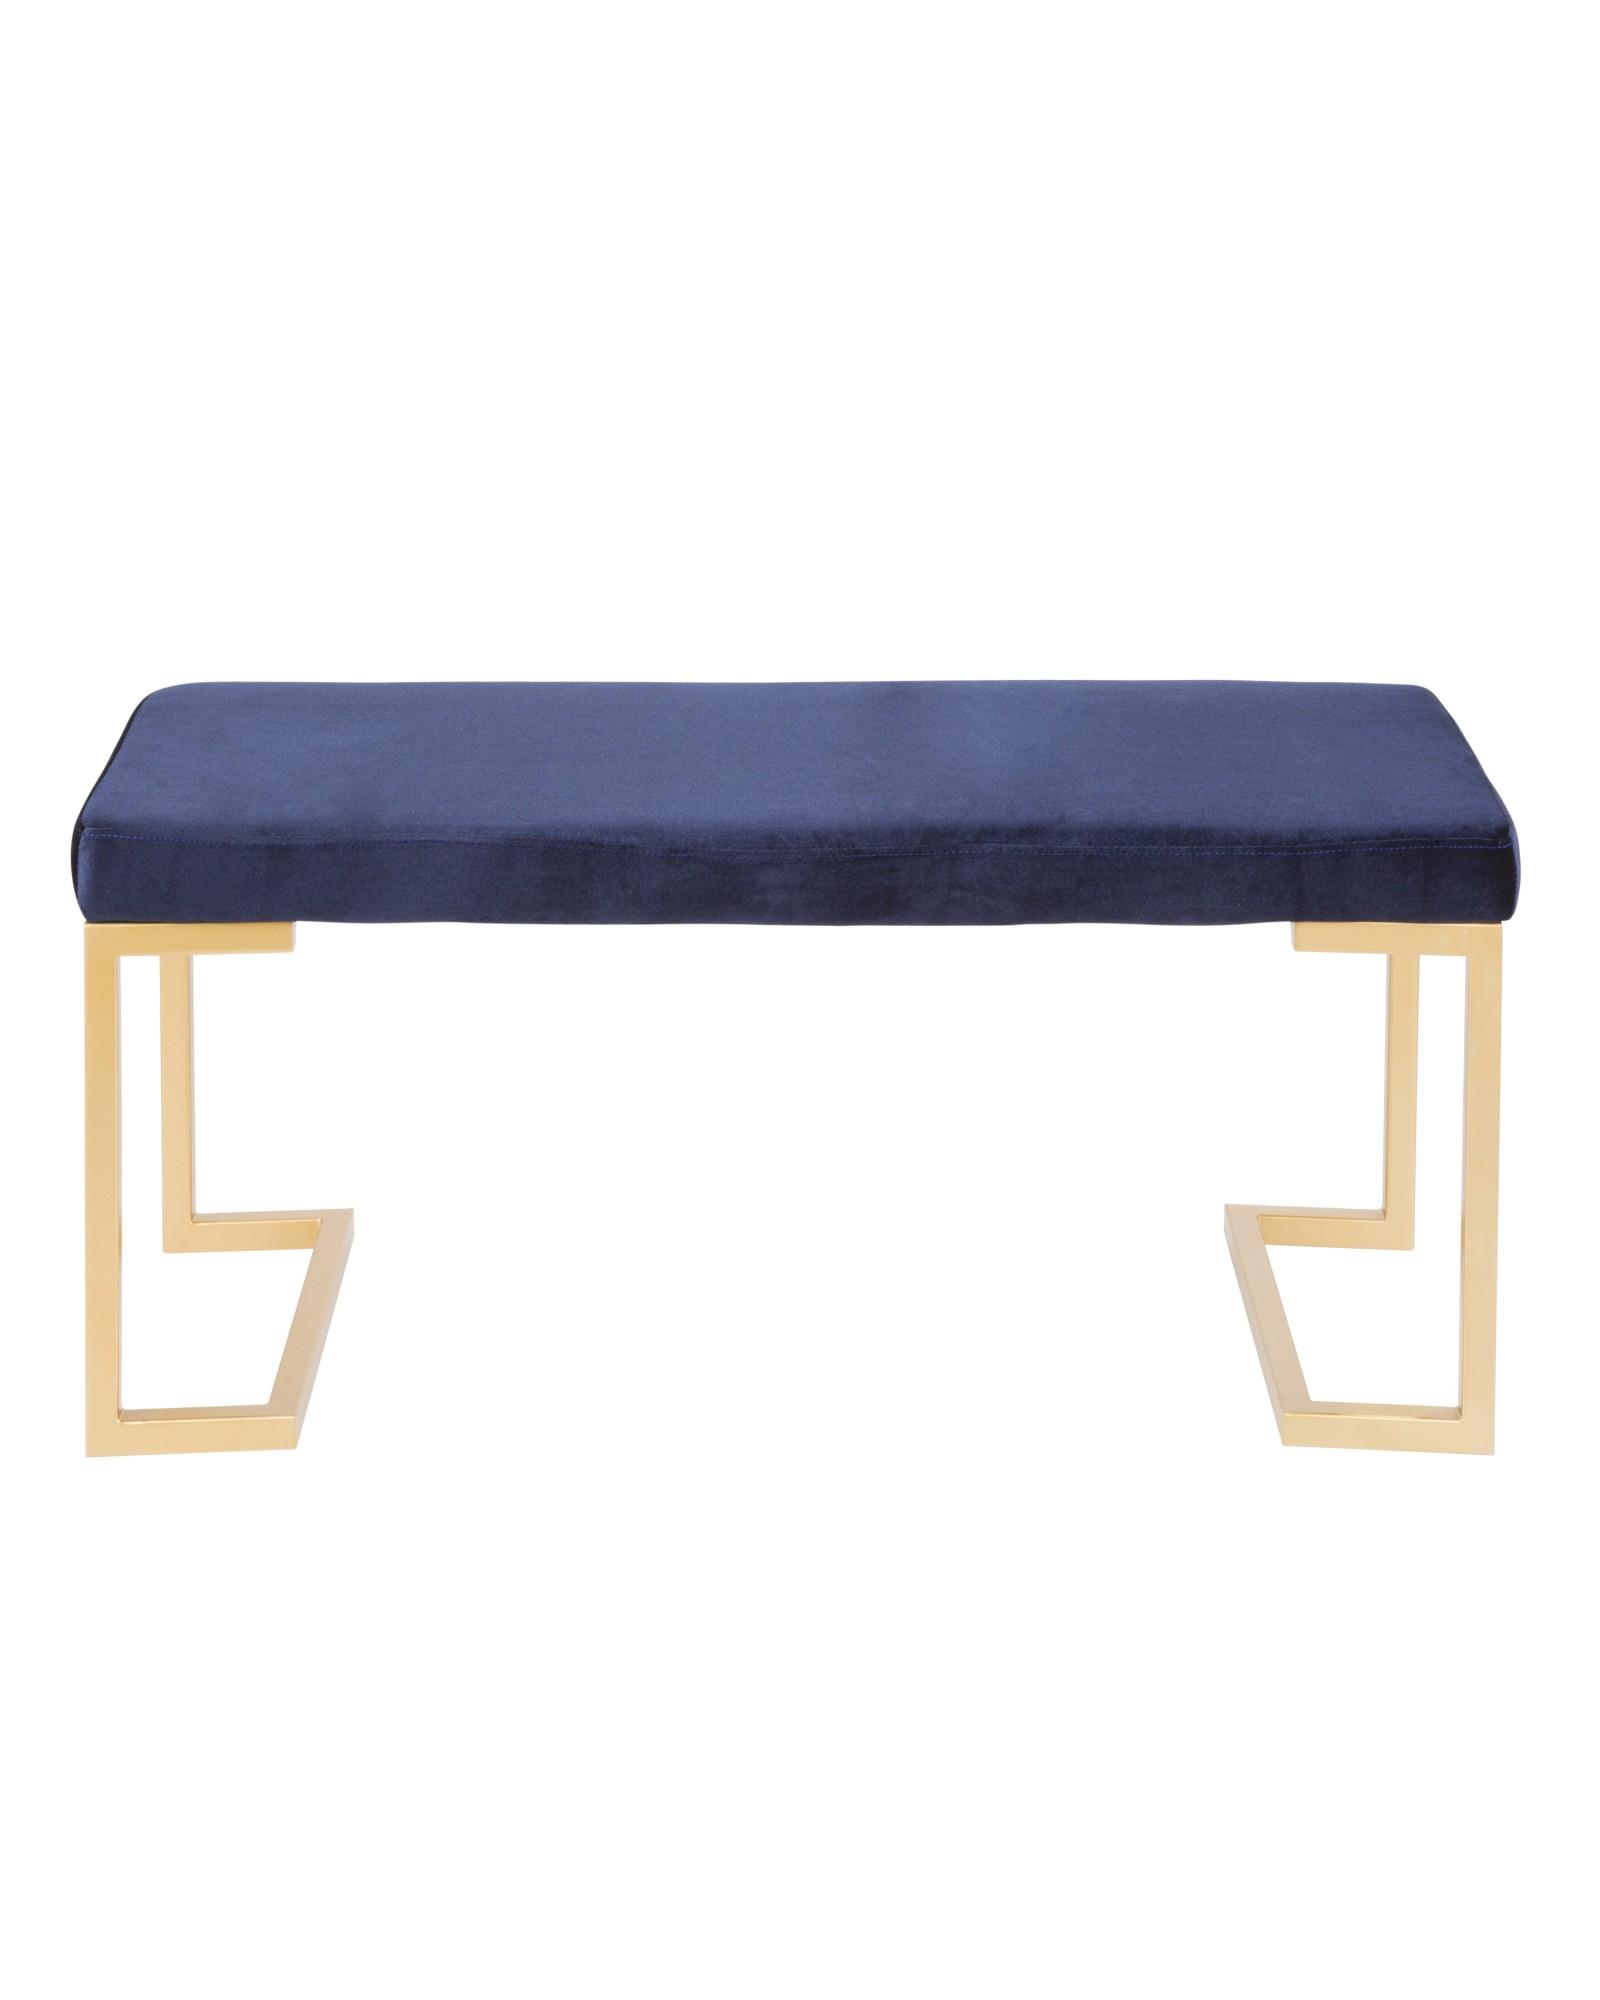 Incredible Midas Bench Midas Contemporary Glam Entryway Dining Bench Dailytribune Chair Design For Home Dailytribuneorg